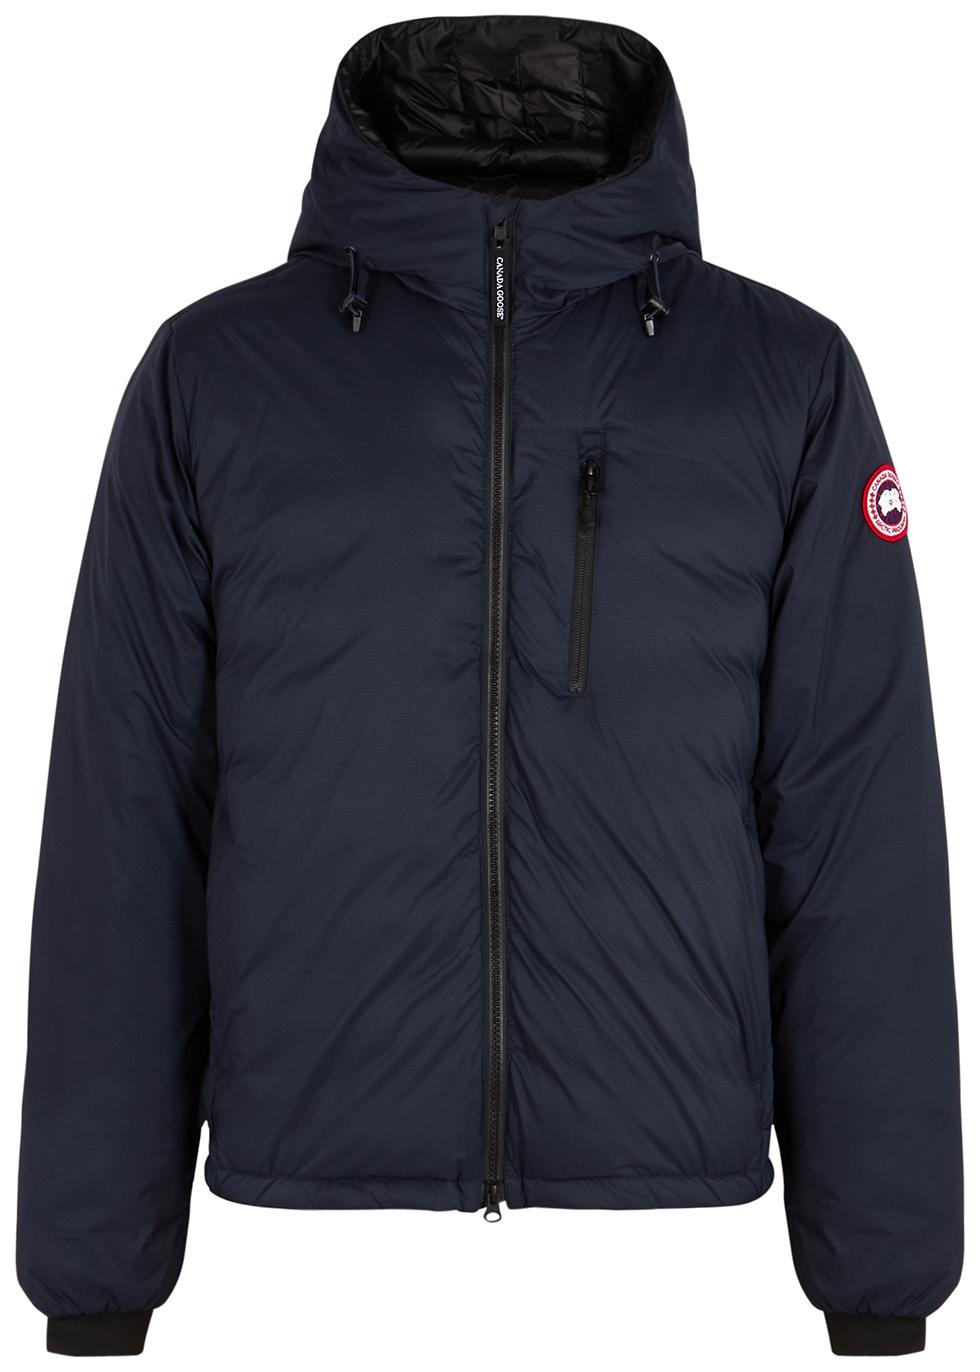 Lodge navy hooded ripstop shell jacket